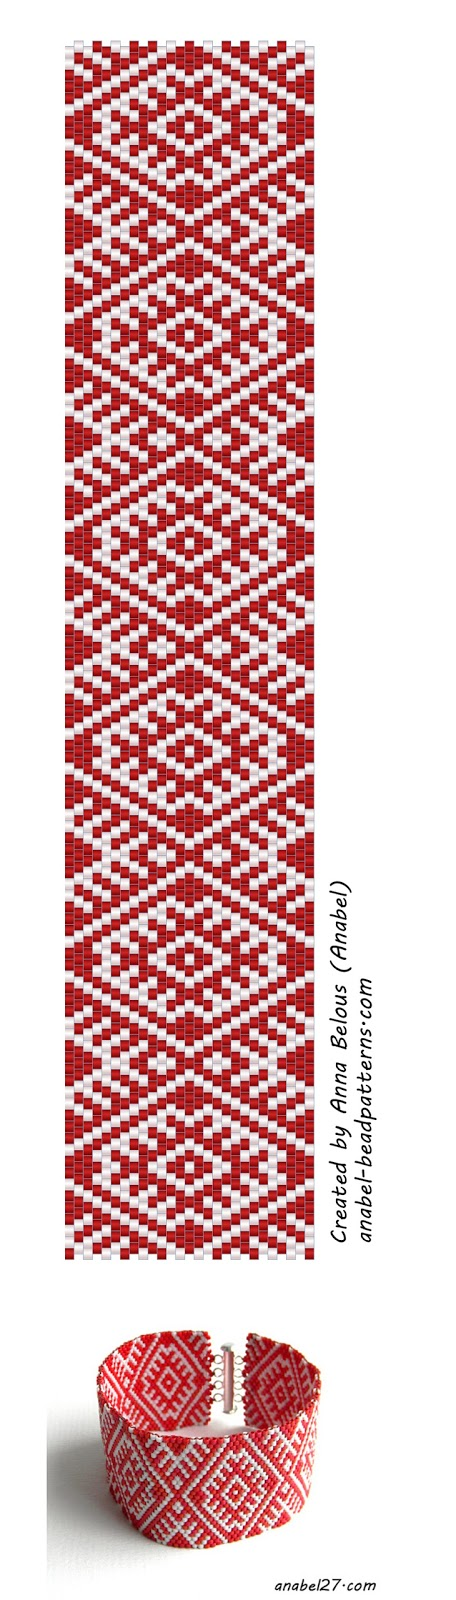 схемы для бисероплетения free peyote patterns Мозаика